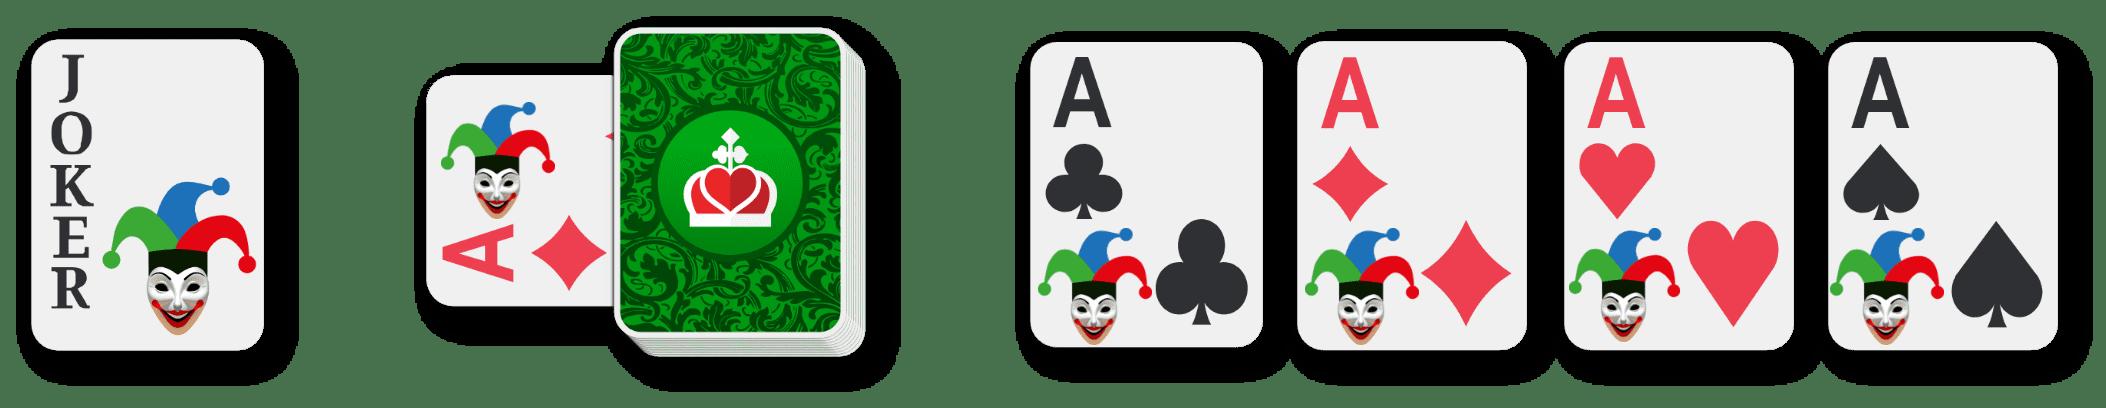 Rummy Joker Card